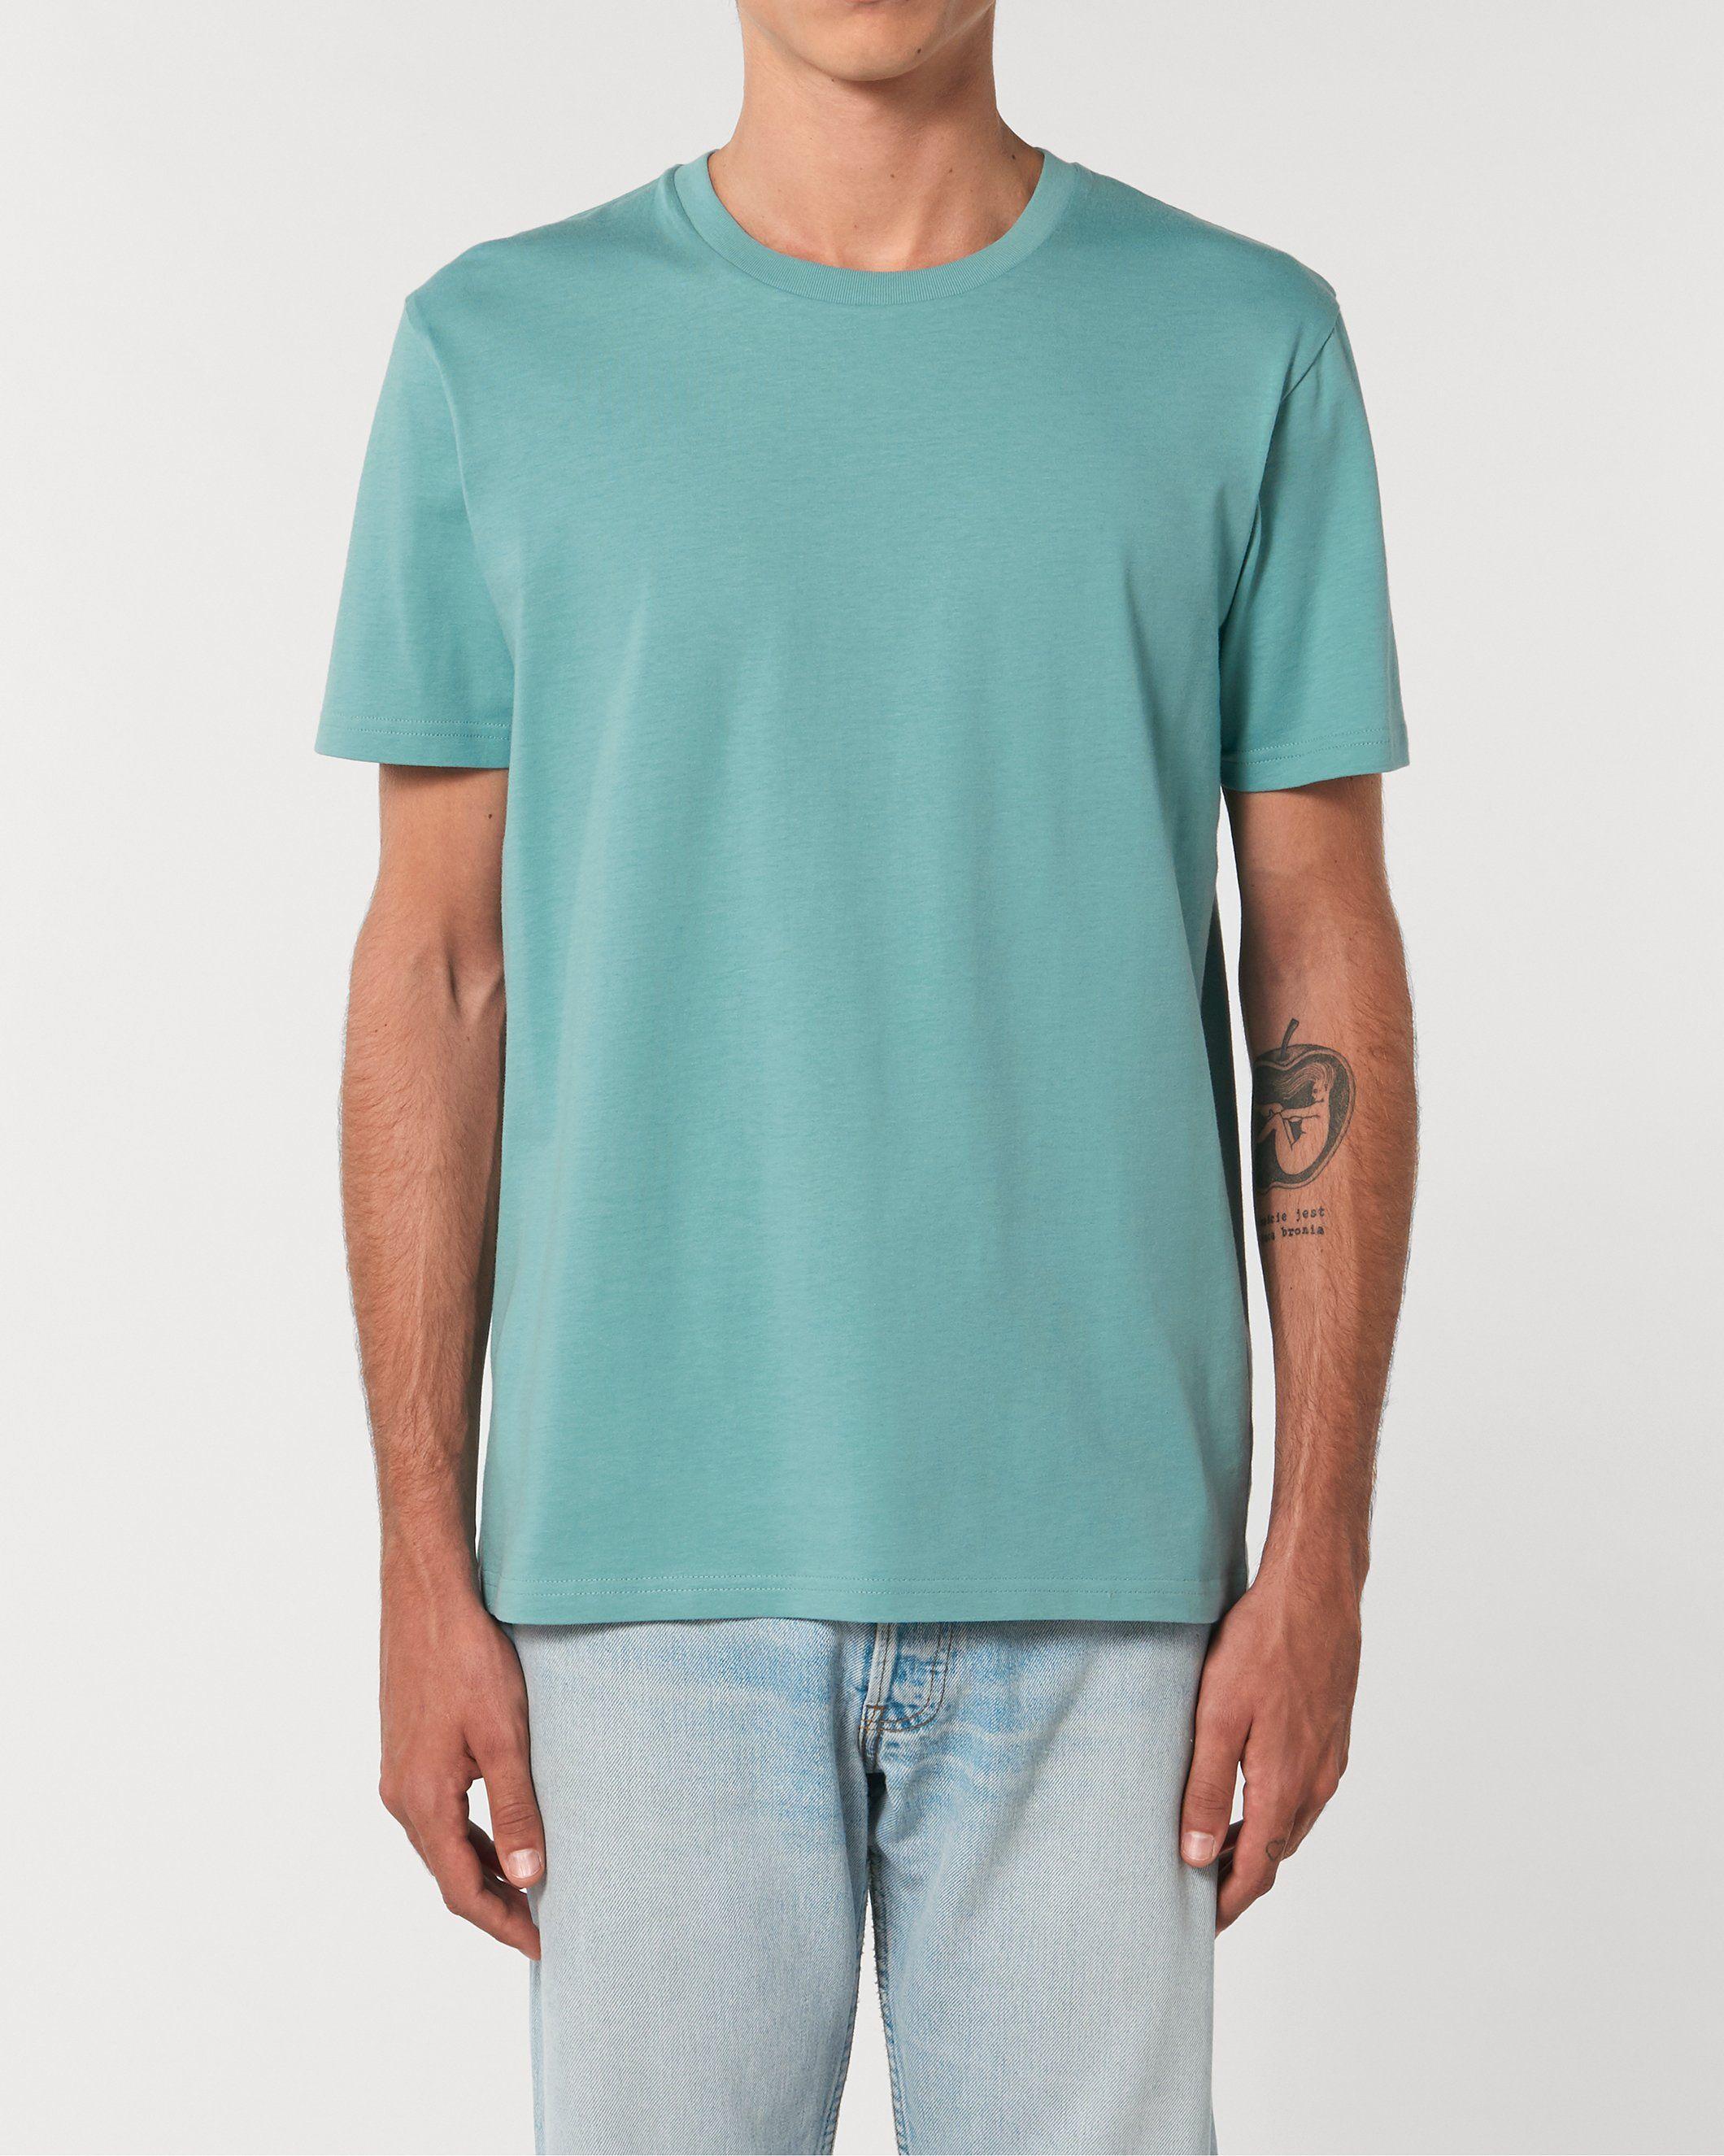 Nauli Unisex Regular Fit T-Shirt in Teal